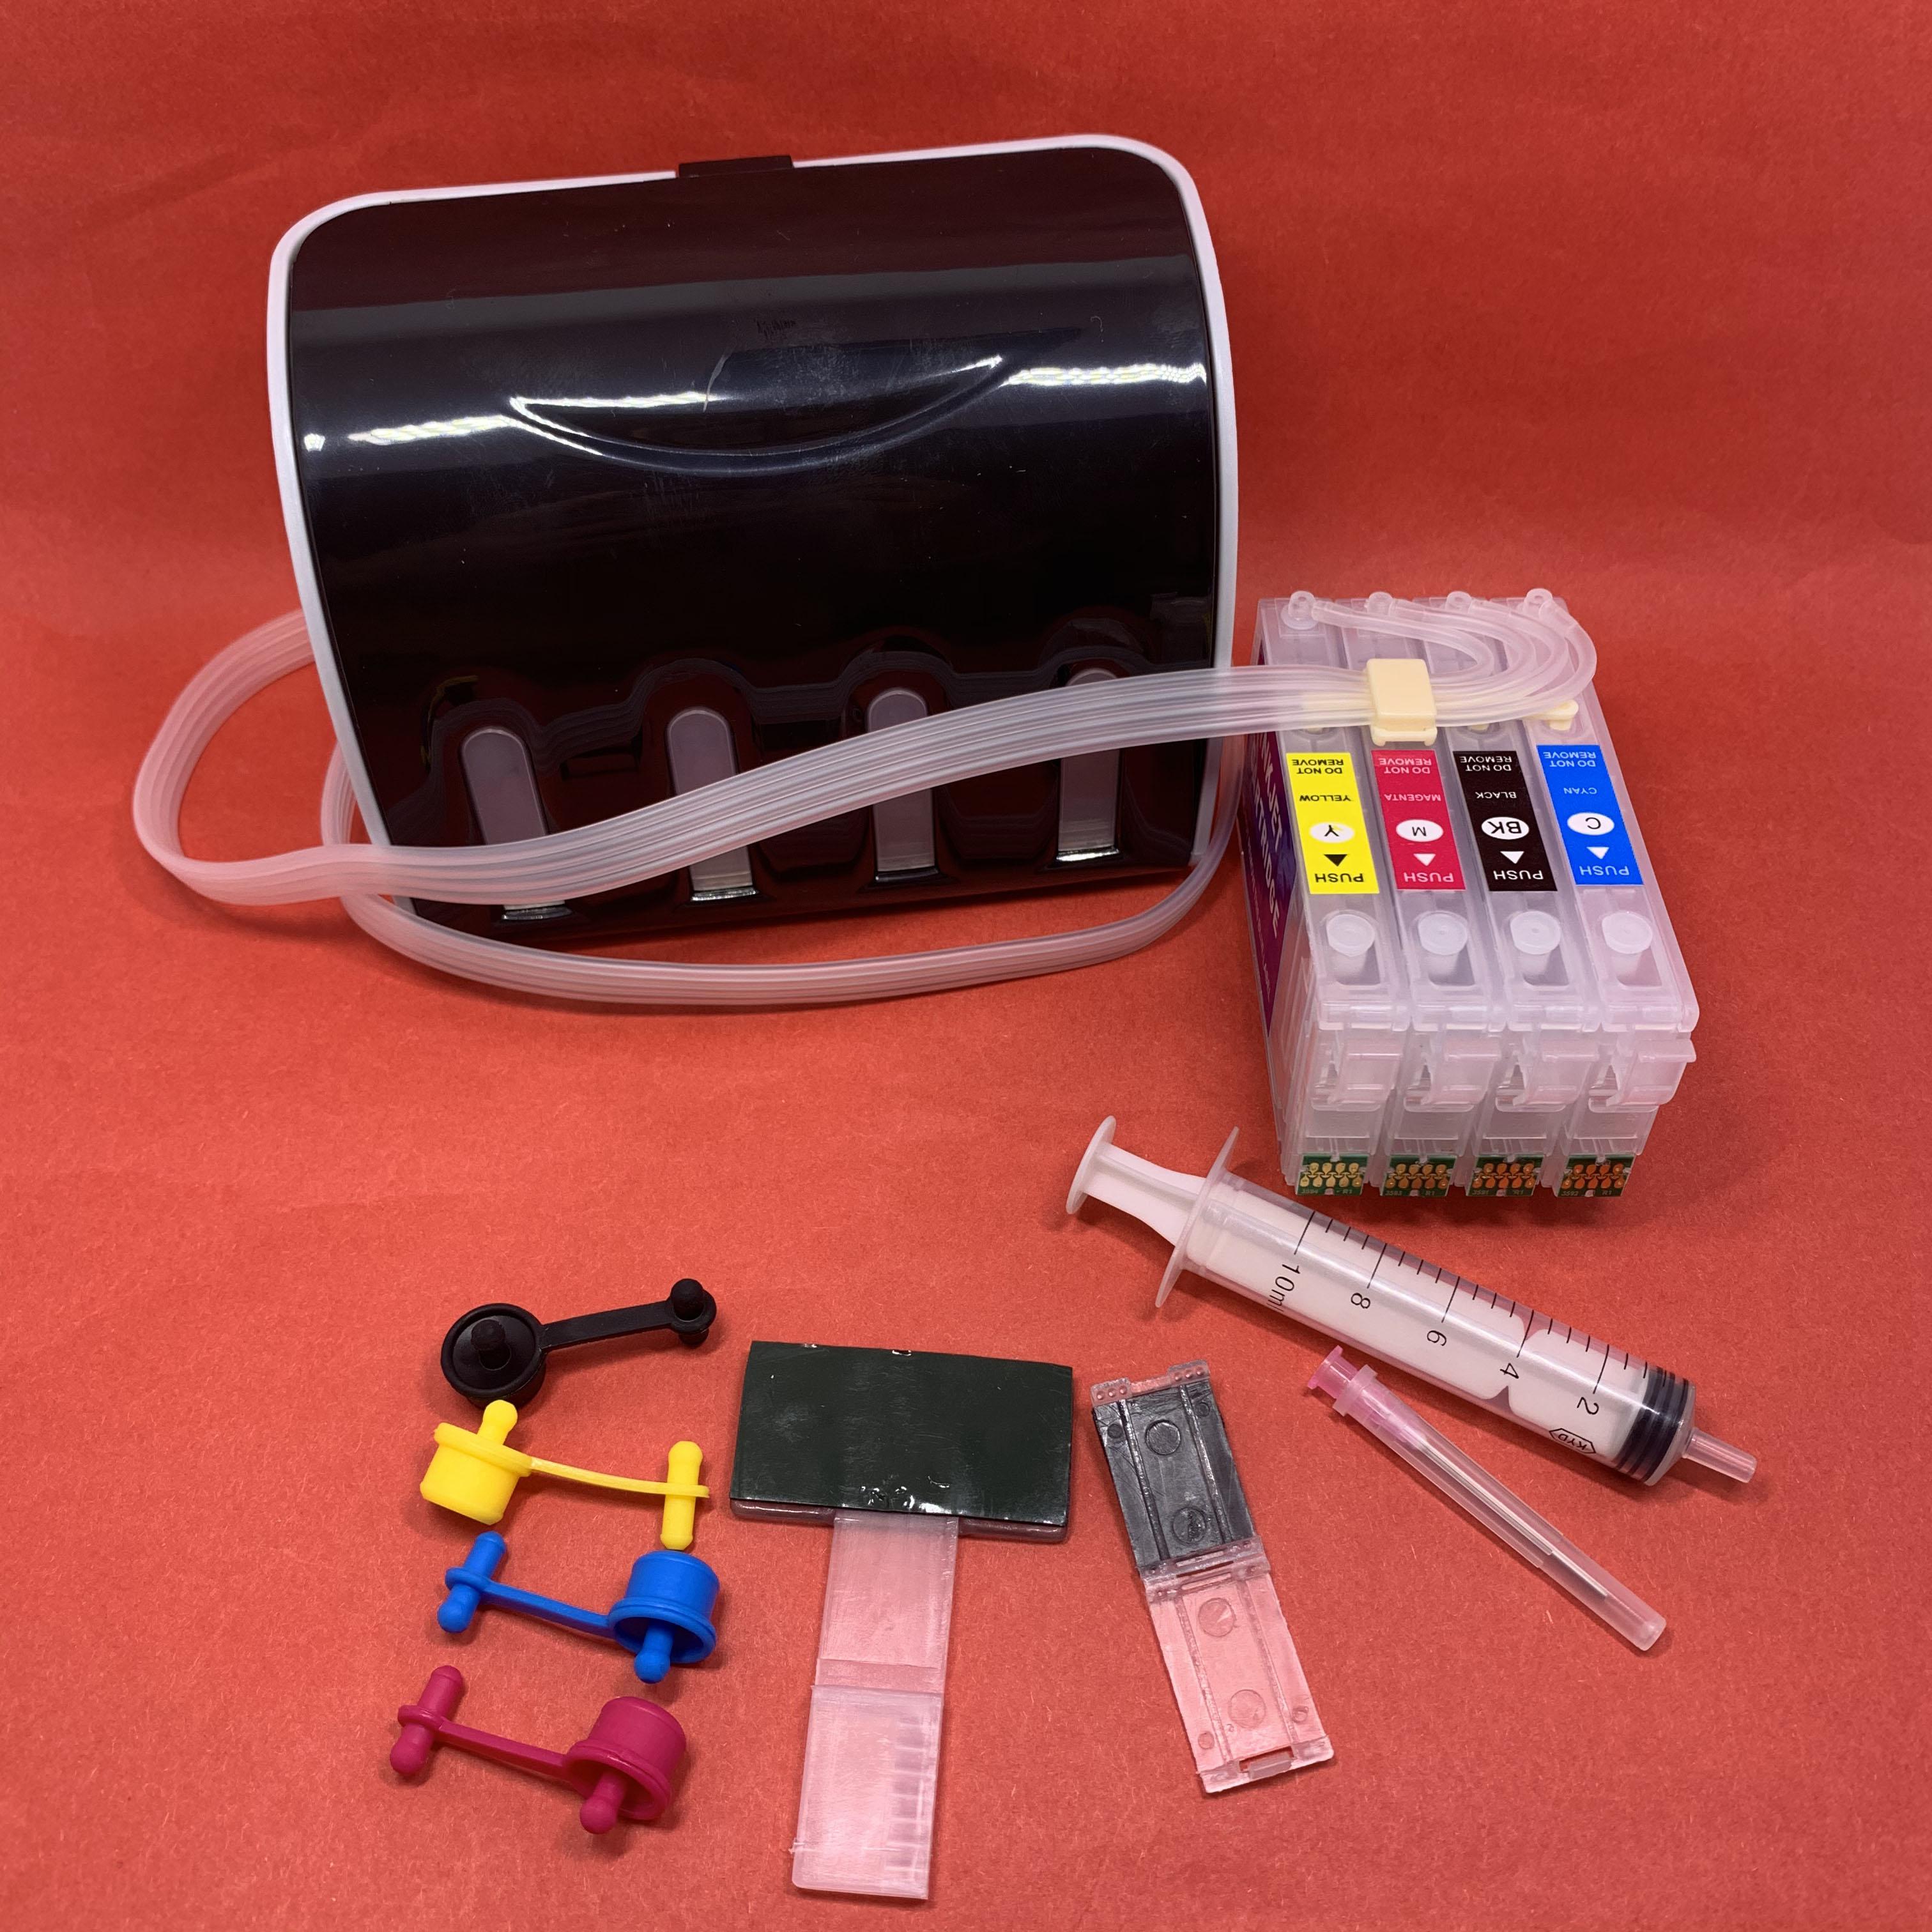 YOTAT CISS 35XL T359XL Ink Cartridge With ARC Chip T3591 - T3594 For Epson Workforce Pro WF-4720 WF-4725 WF-4740